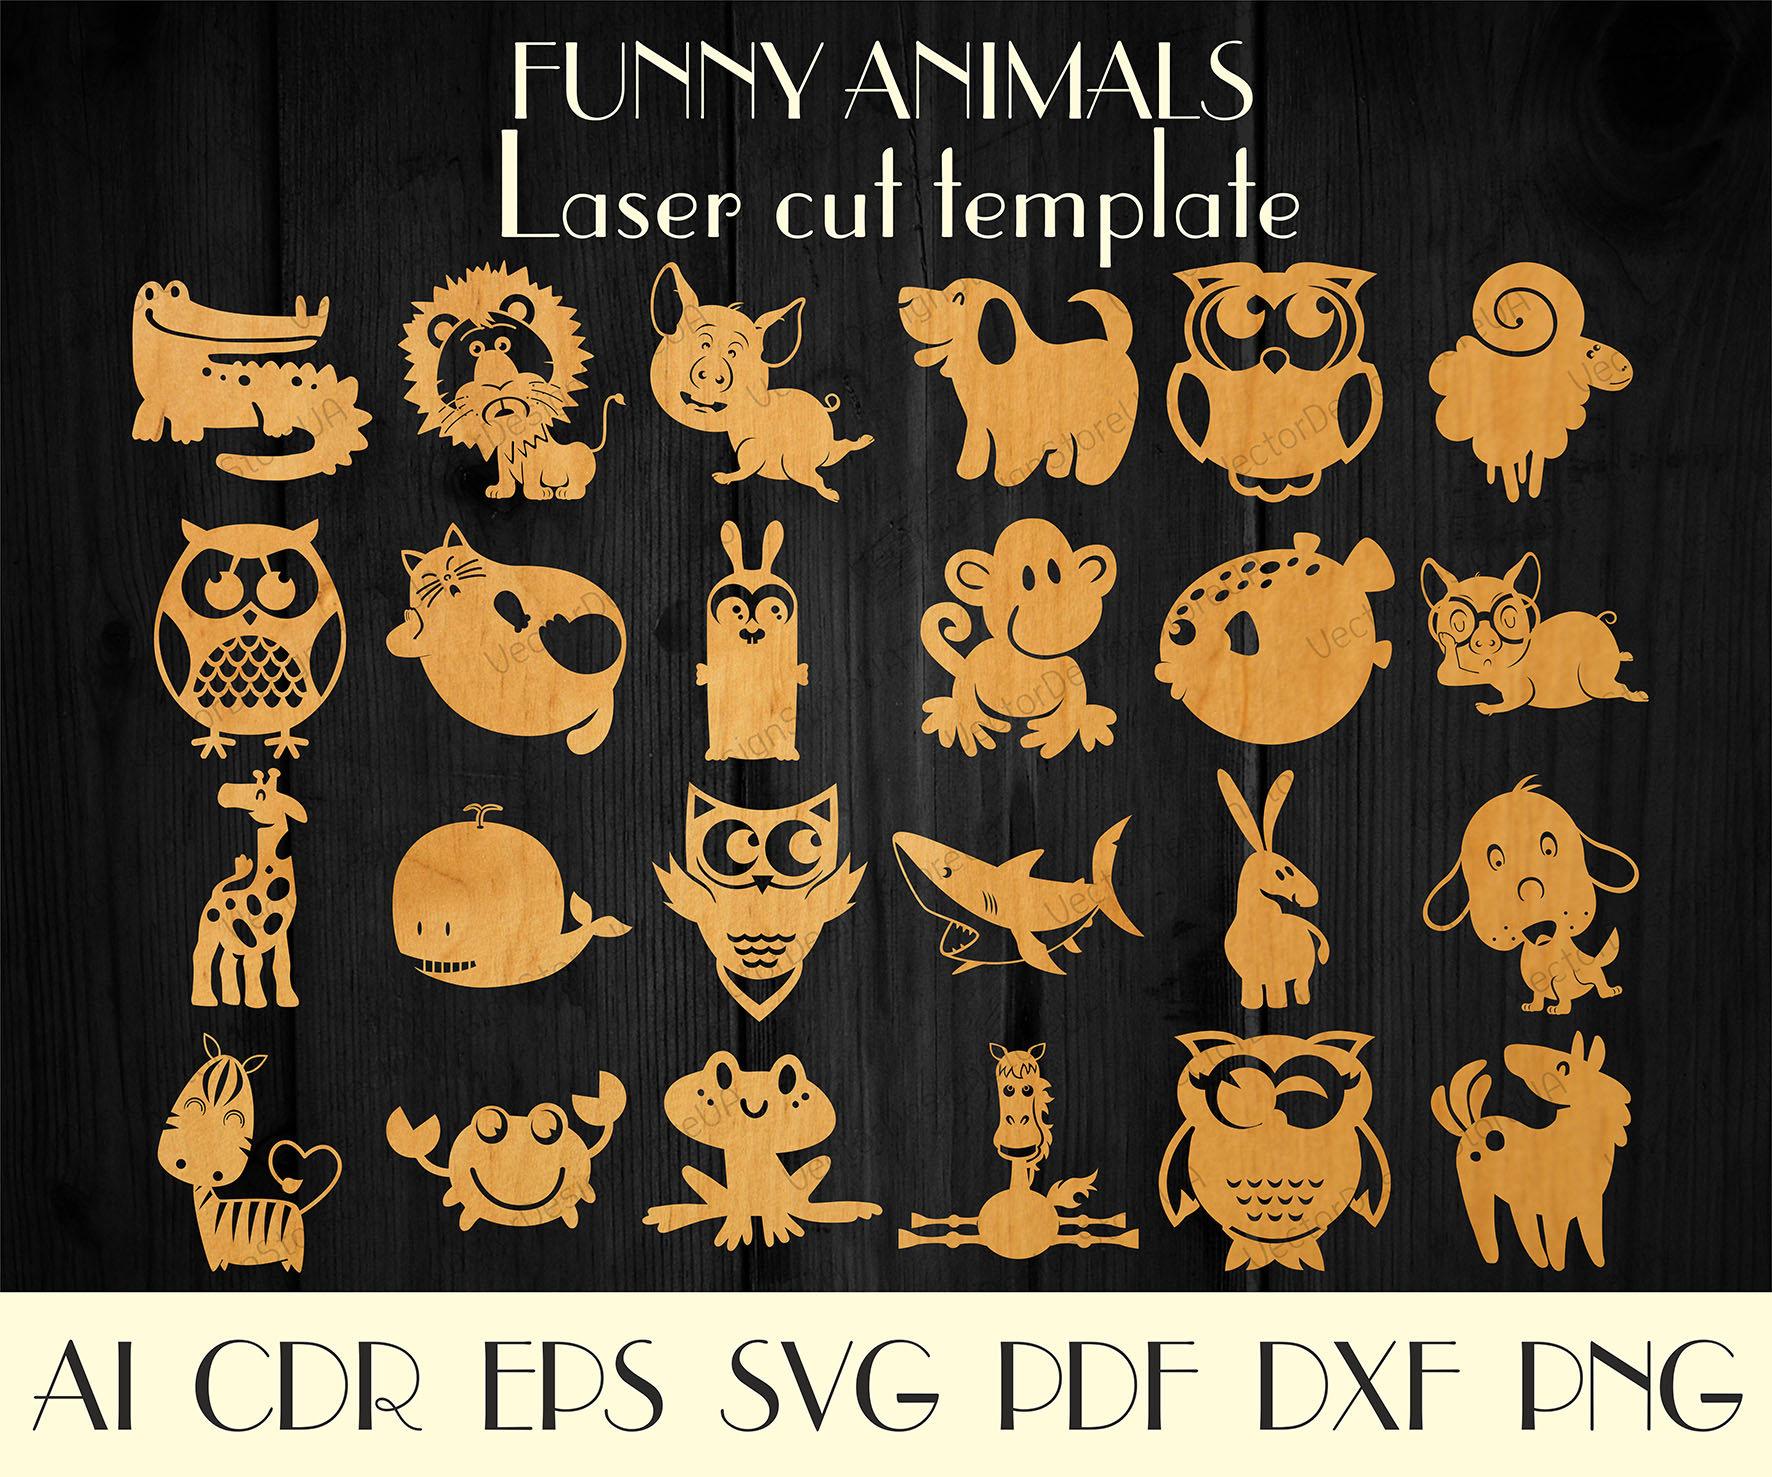 Set 24pcs Funny Animal Figuresanimals Laser Cut Animal Etsy